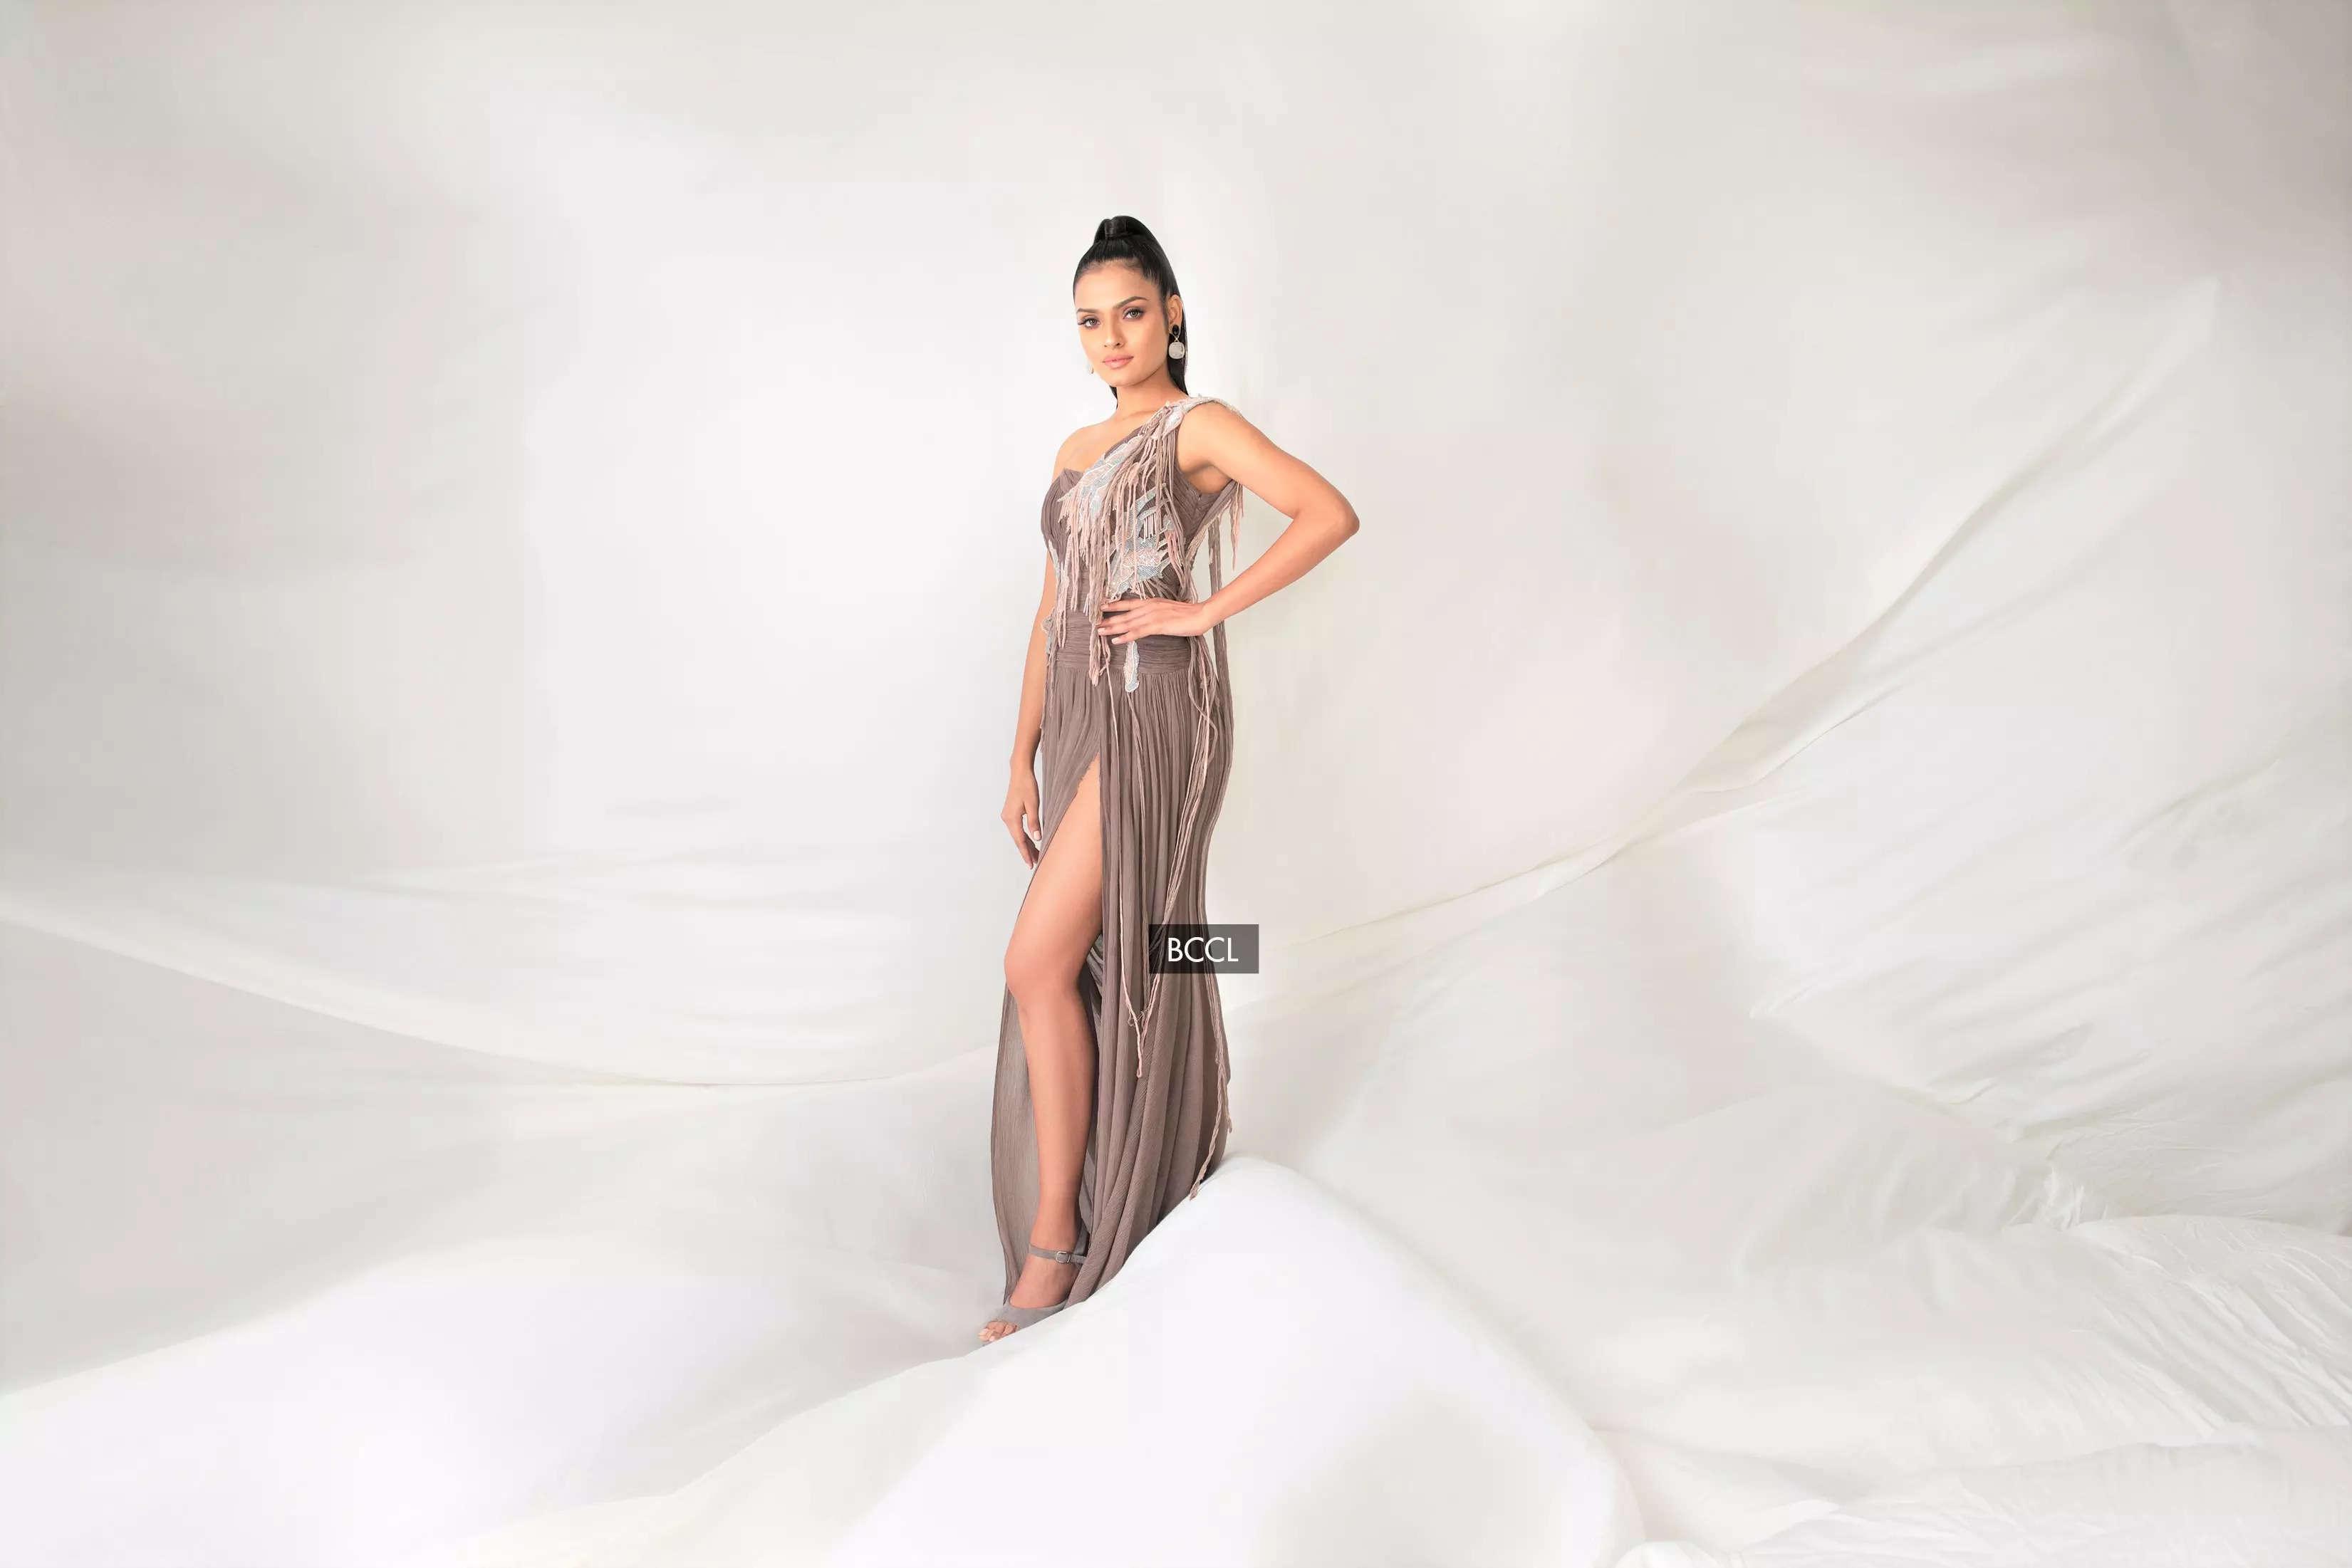 LIVA Miss Diva 2021 official unveiling!